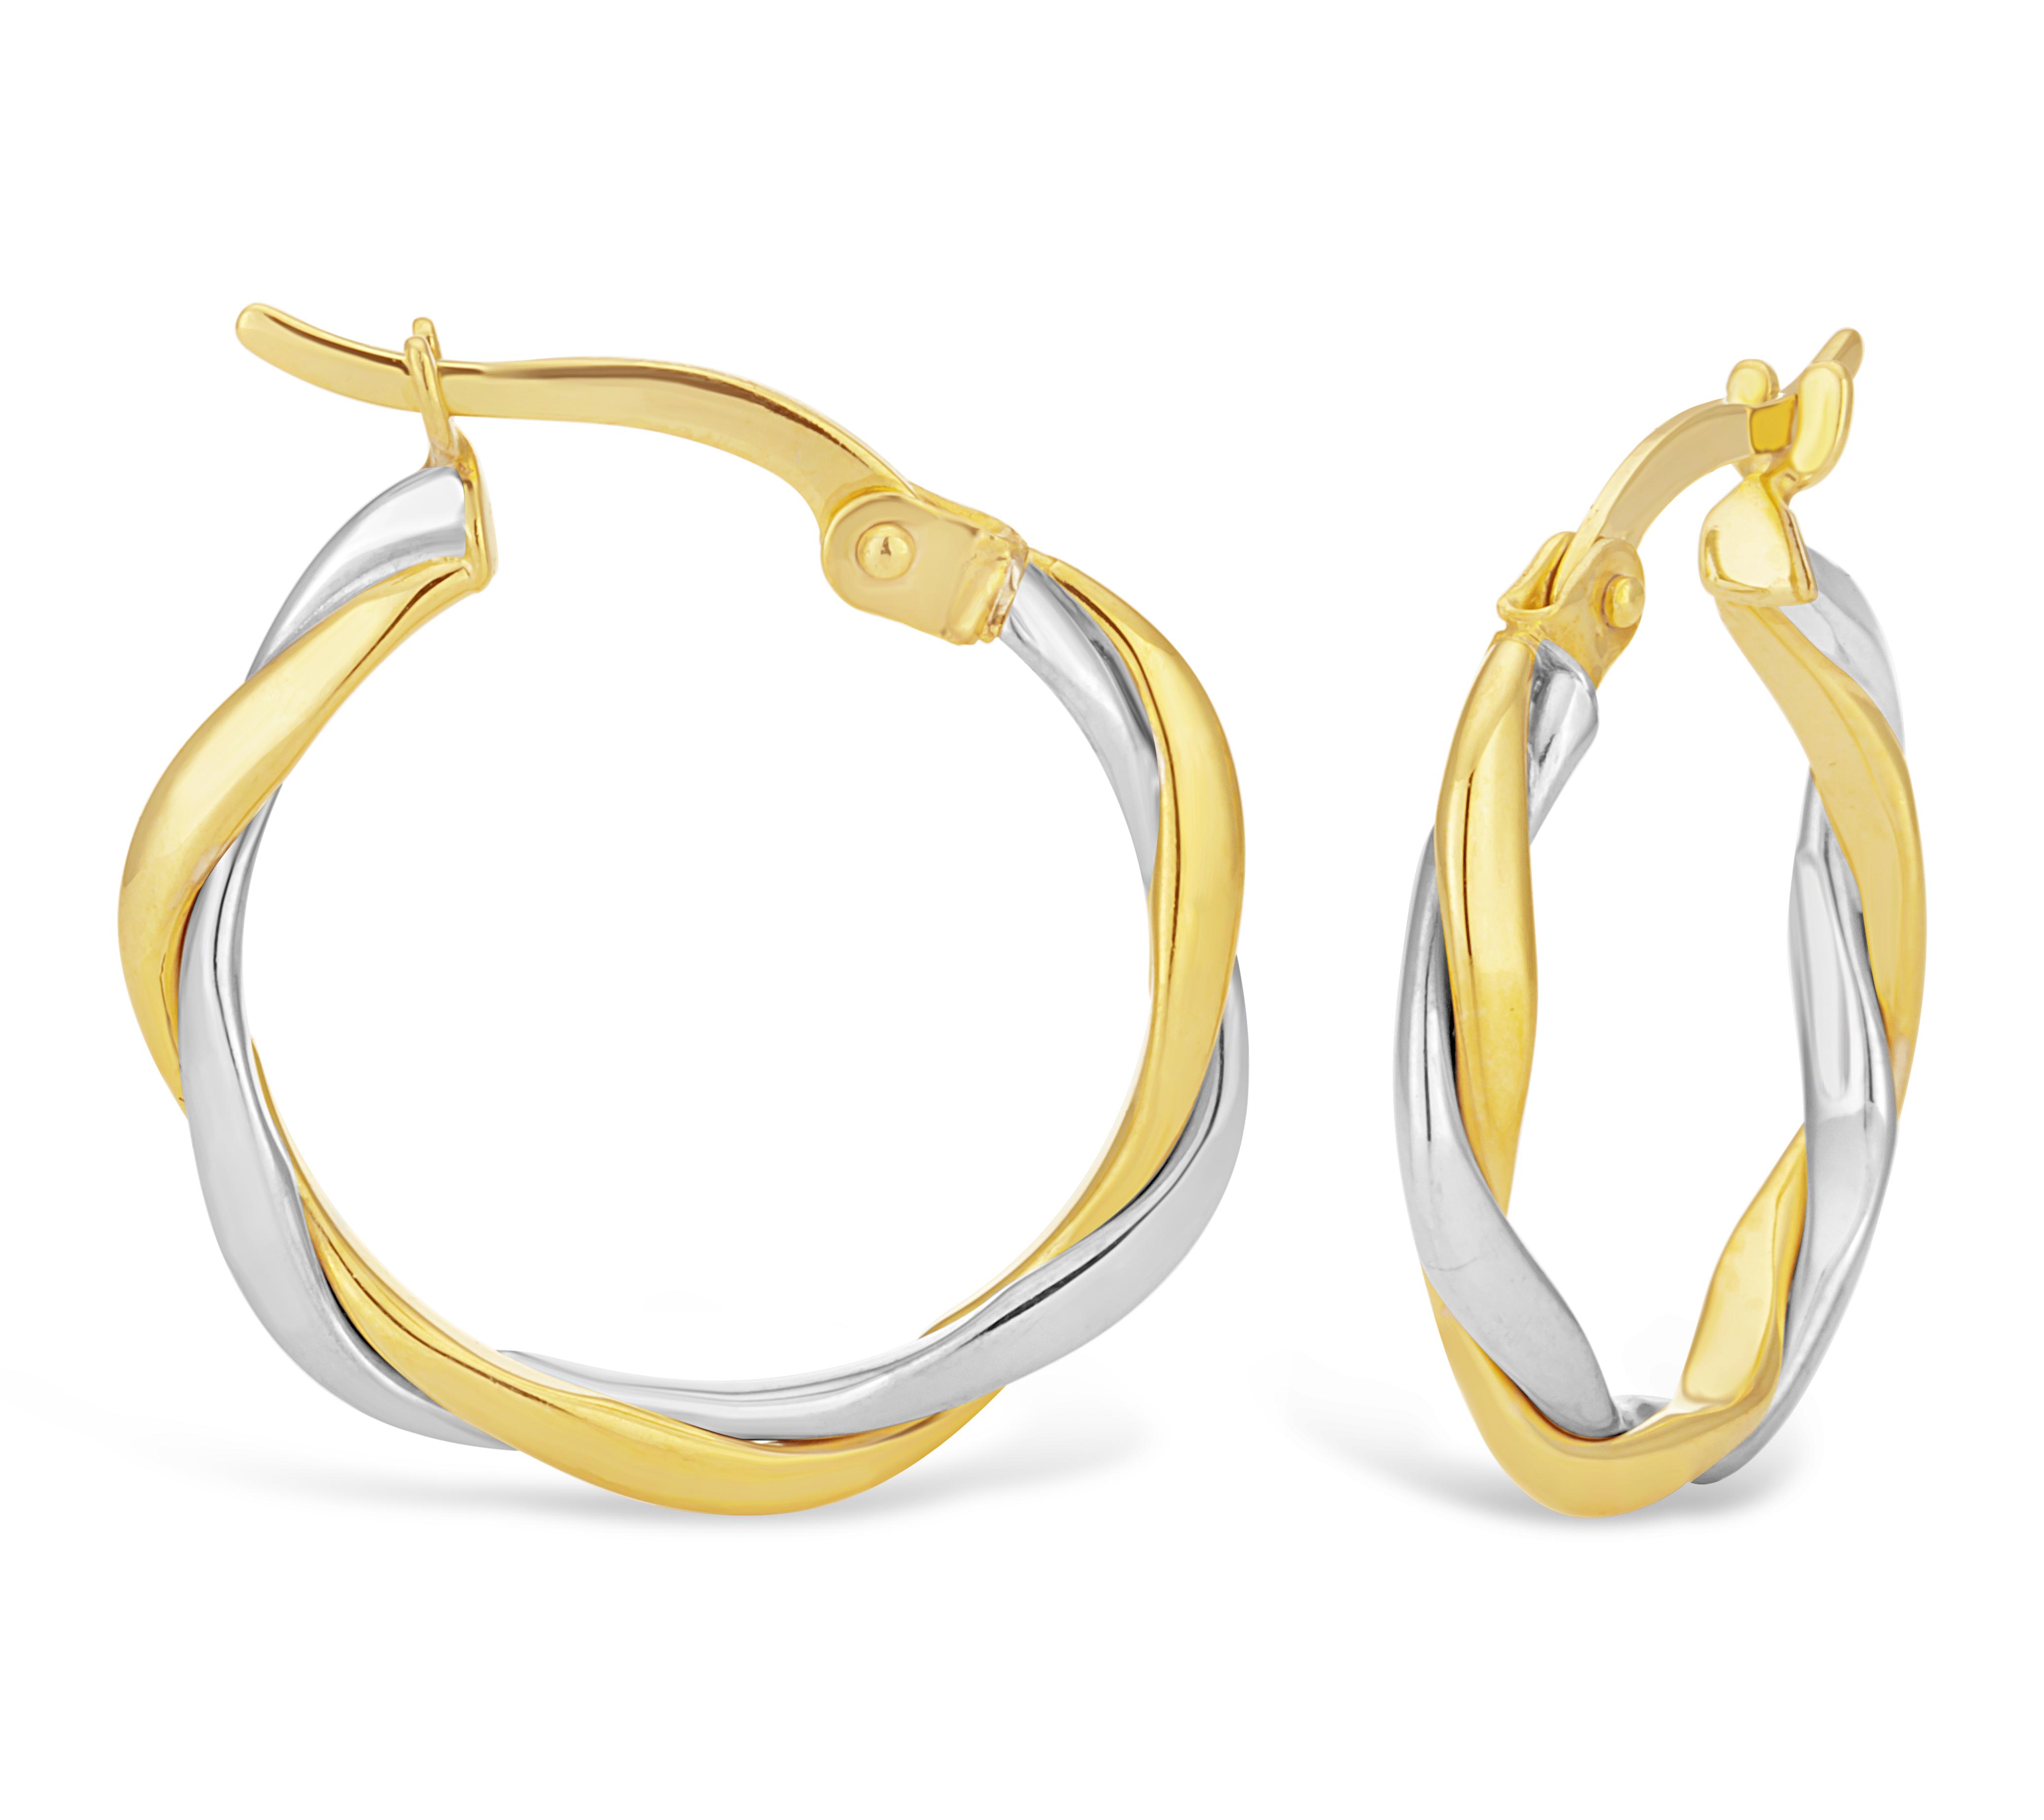 9ct Two-Tone Gold Filled Twist Hoop Earrings